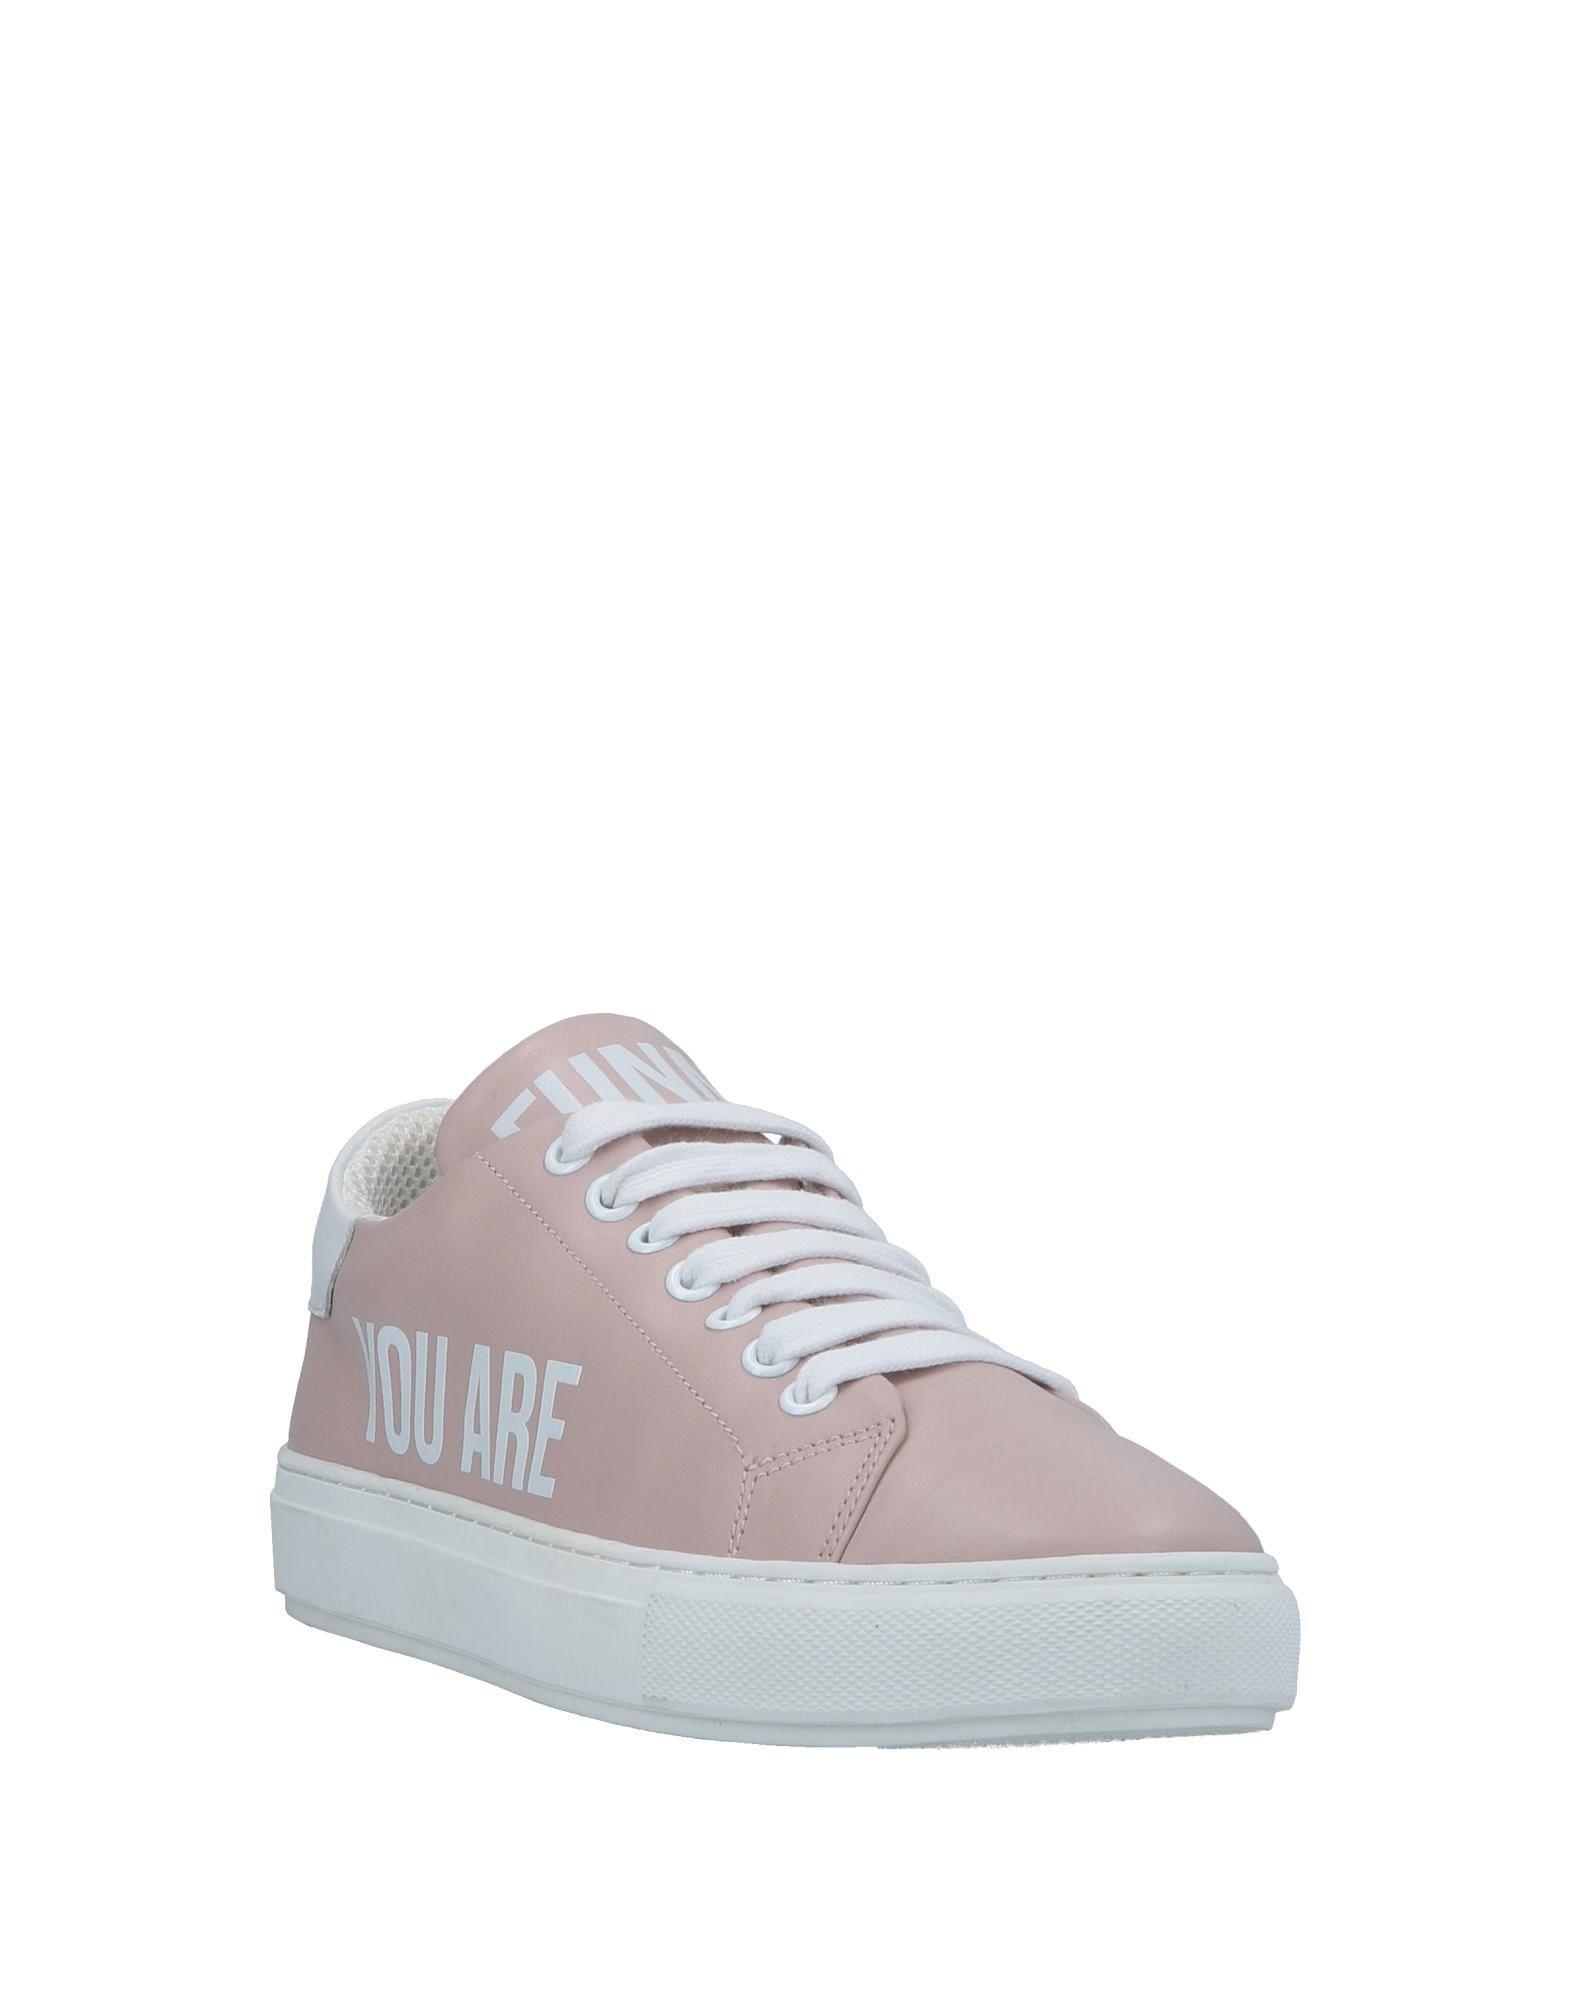 Stilvolle Damen billige Schuhe Pinko Sneakers Damen Stilvolle  11584259AX 7403b3